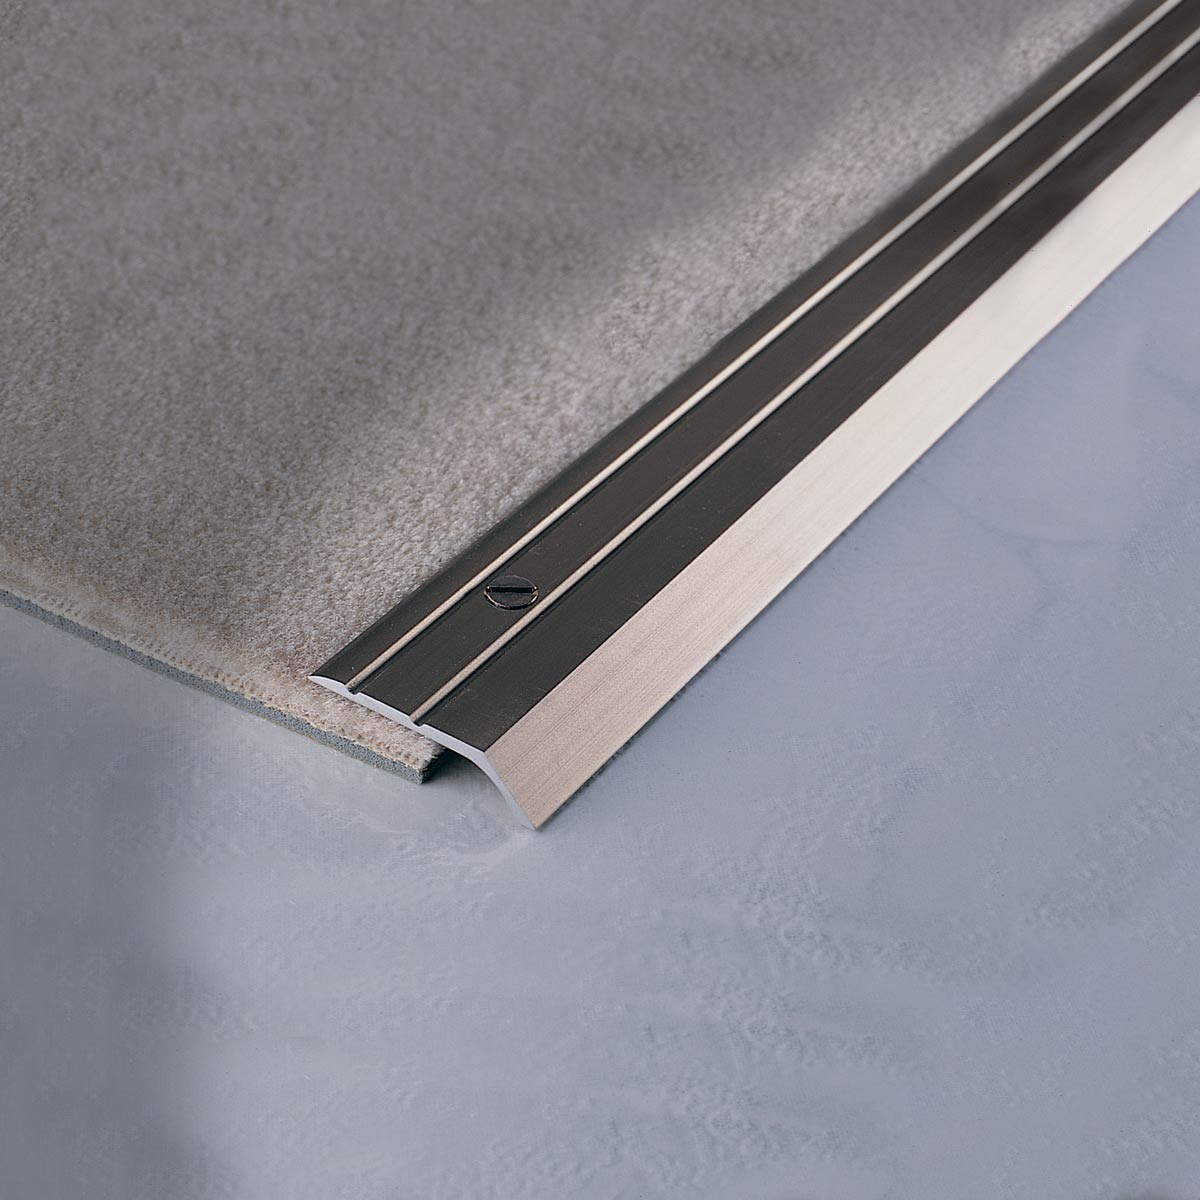 Profili per pavimenti Leveltec RP 50 ABF Profilitec